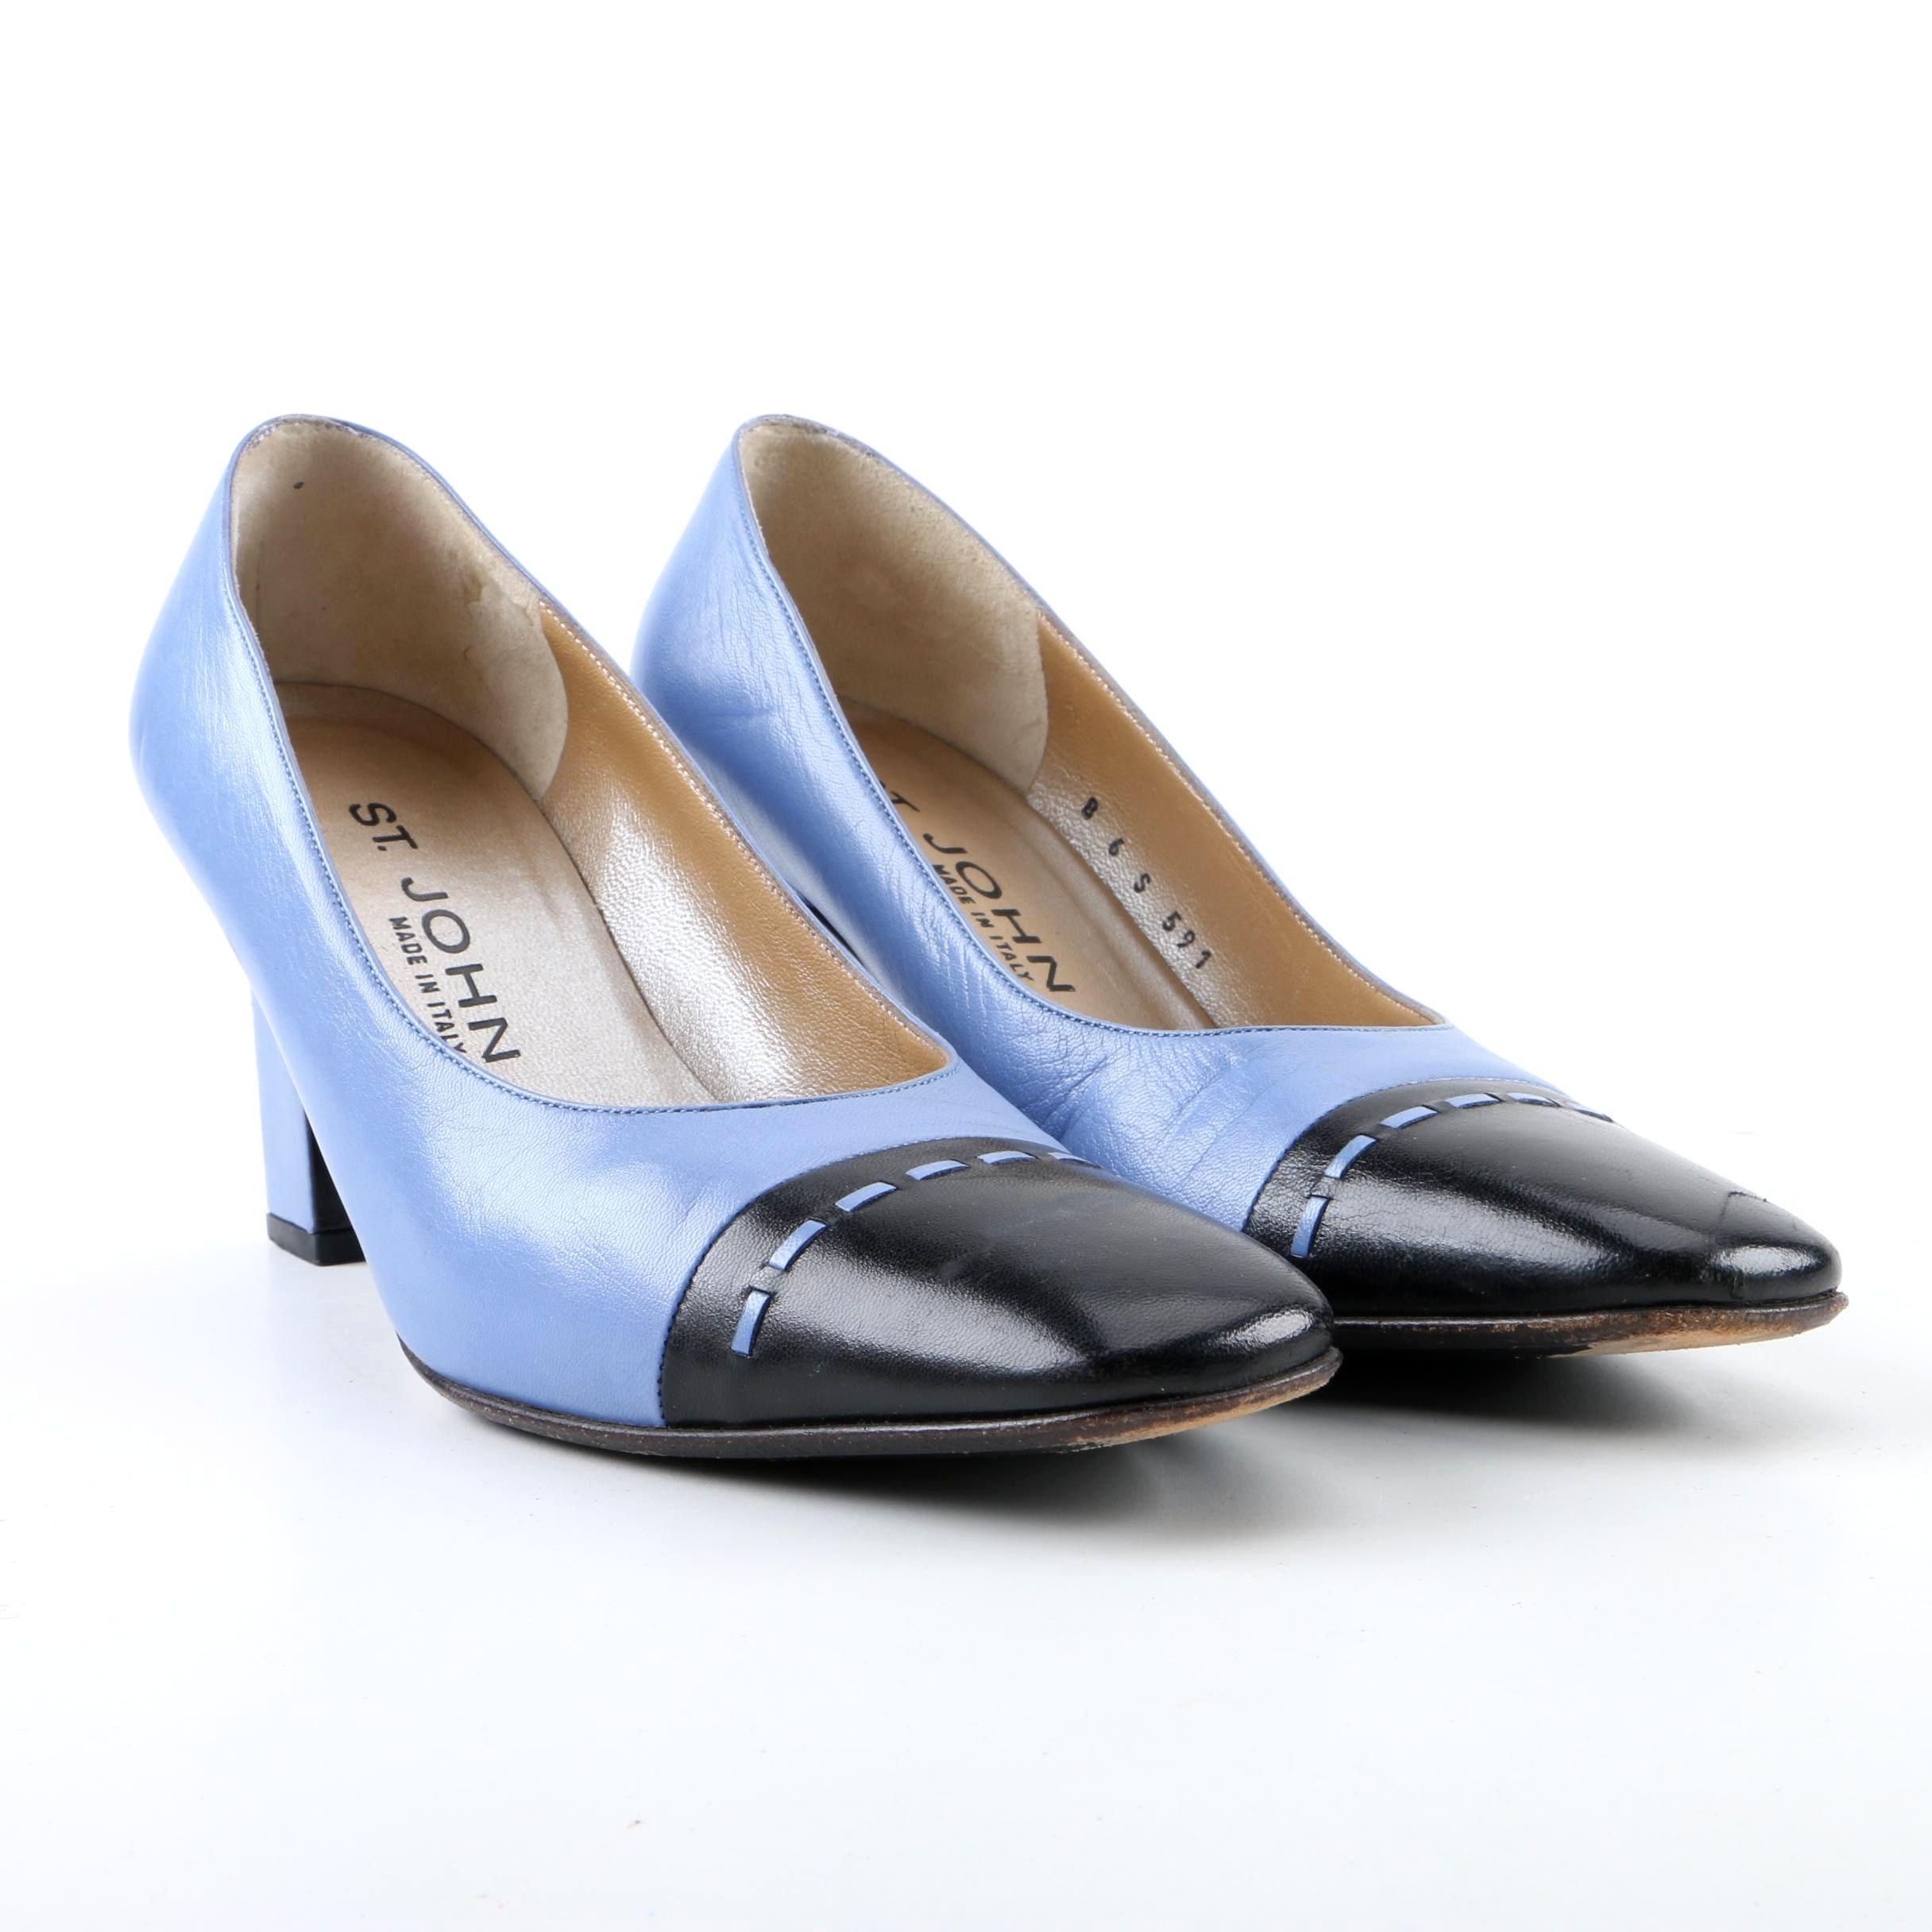 St. John Light Blue and Black Toe Cap Leather High-Heeled Pumps